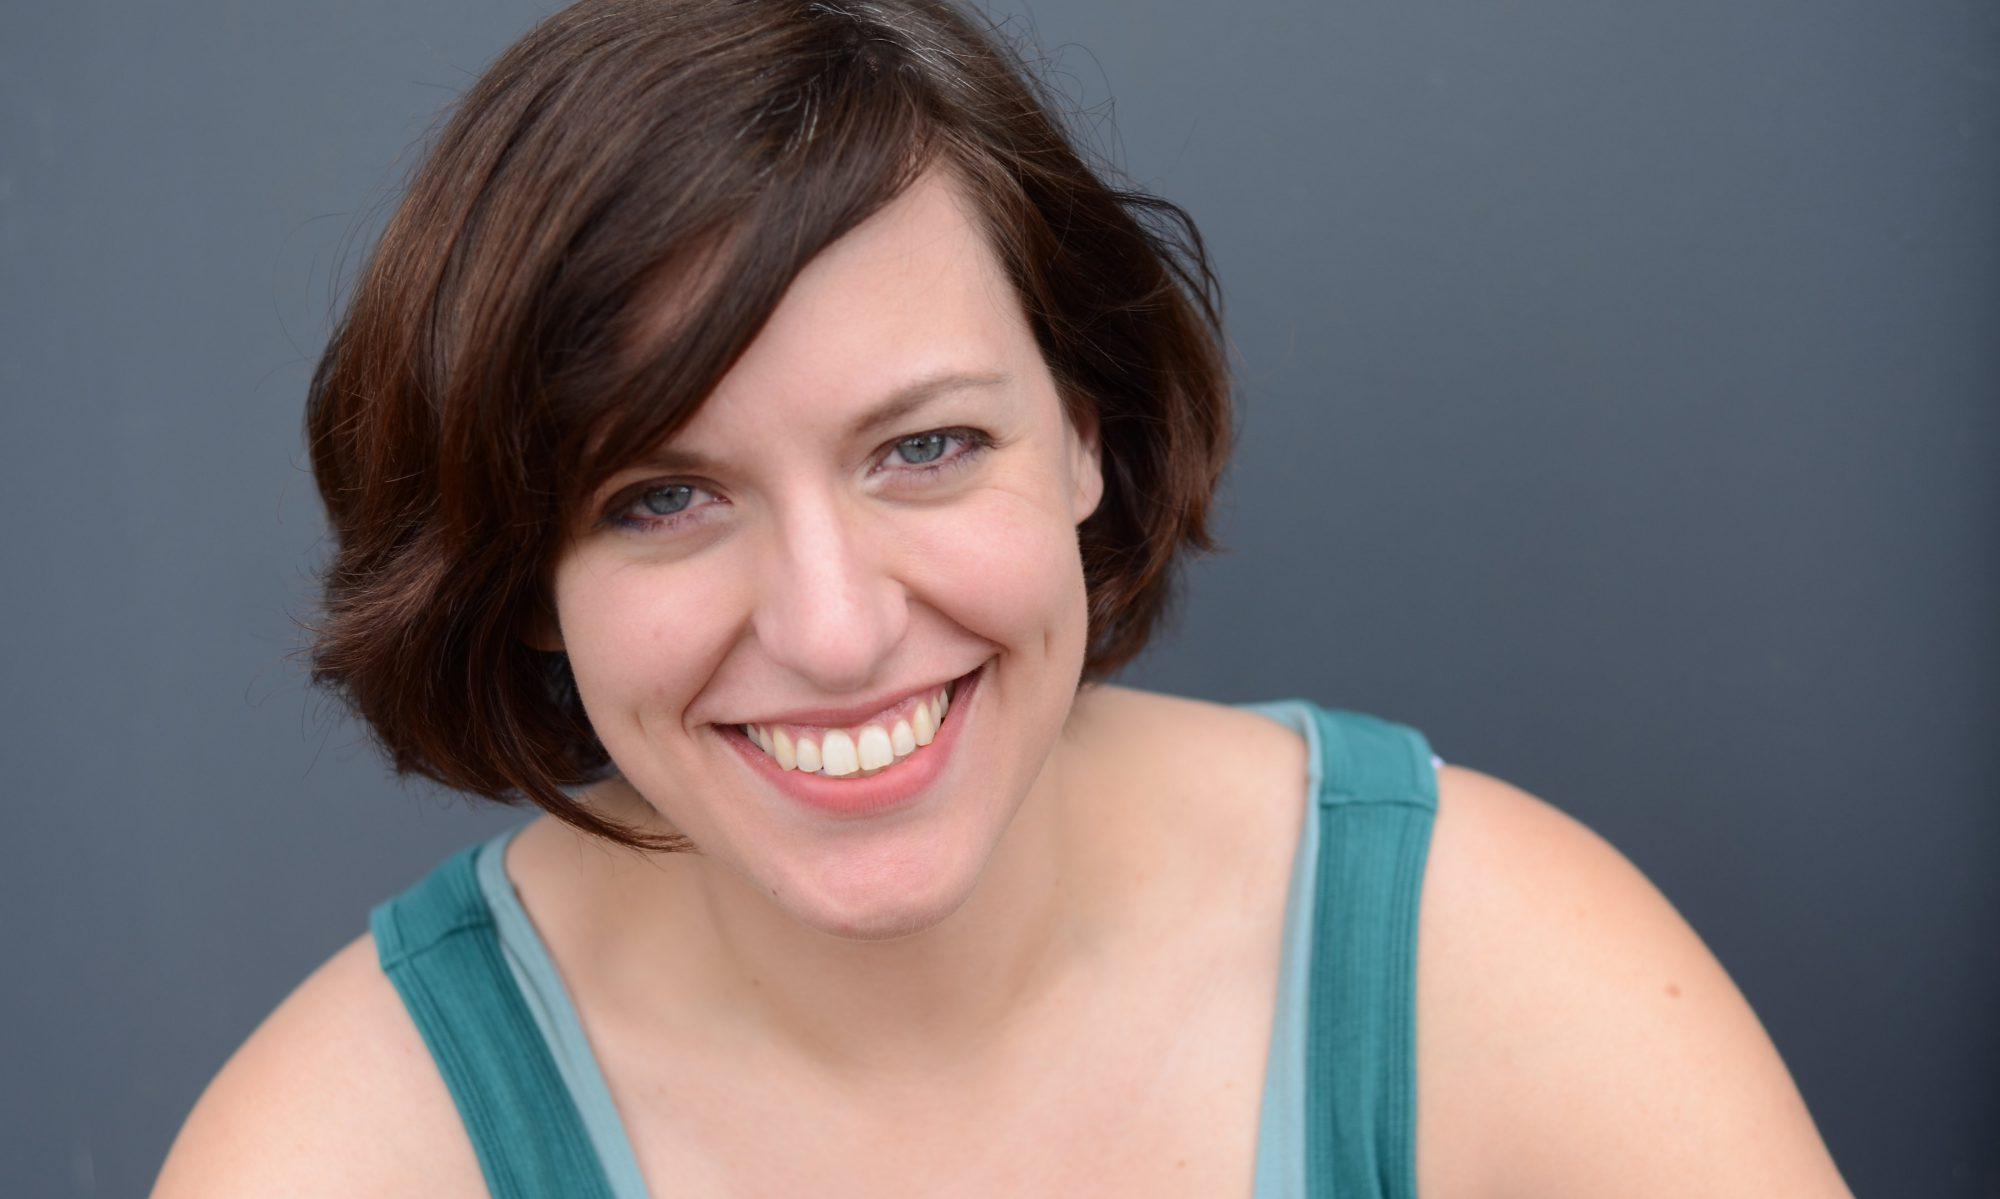 Catie Osborn